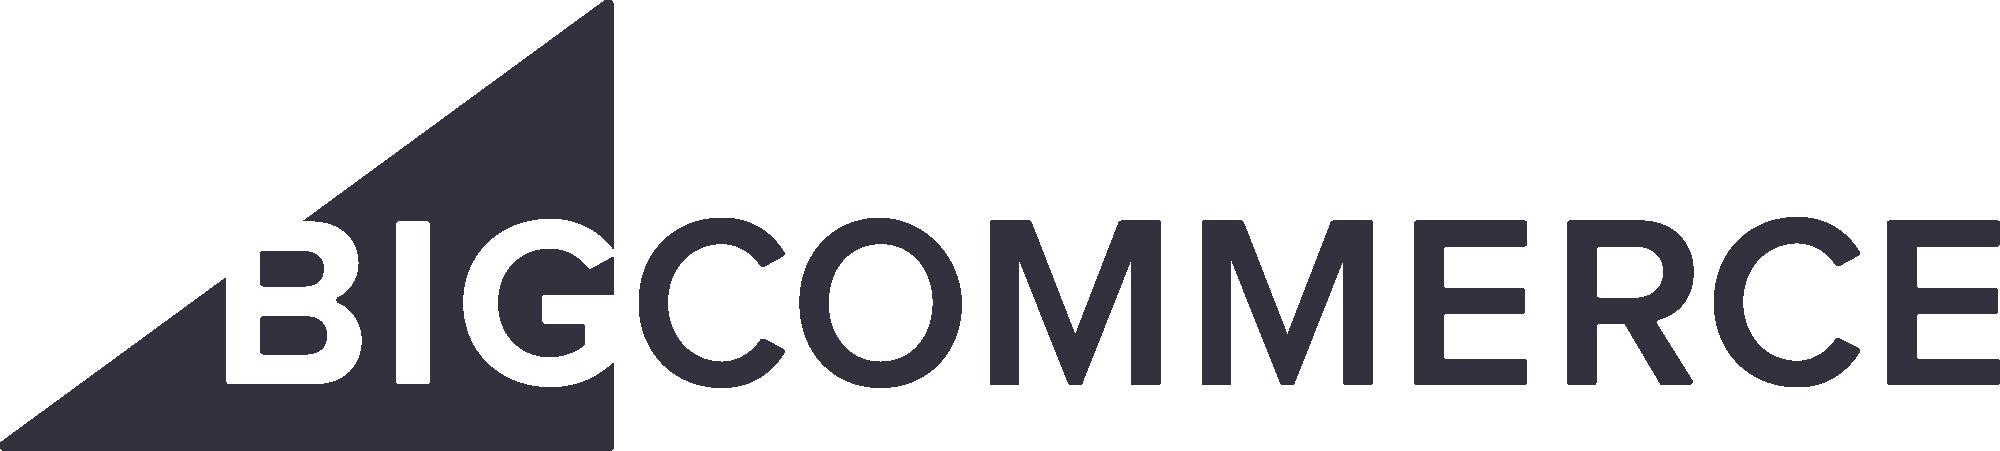 Bigcommerce logo dark